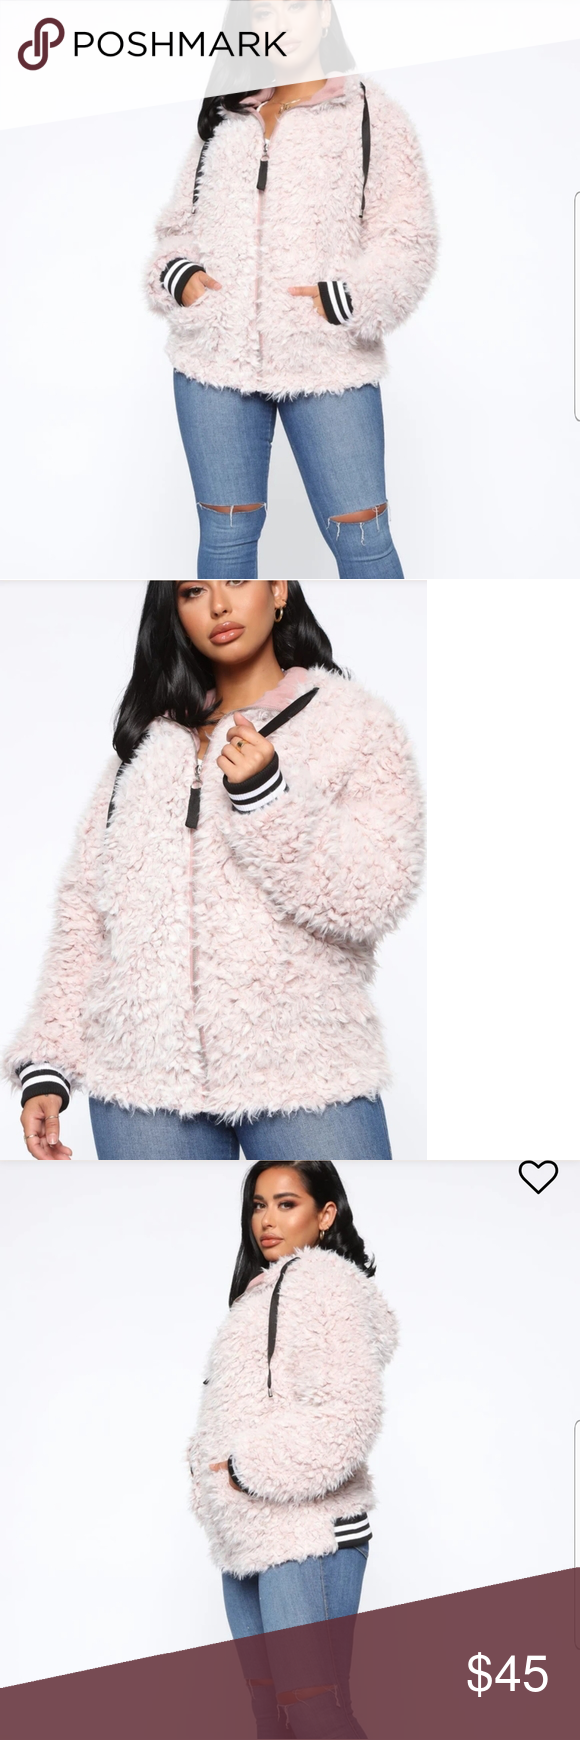 Fuzzy Bomber Jackets Fashion Clothes Design Womens Fashion Shopping [ 1740 x 580 Pixel ]